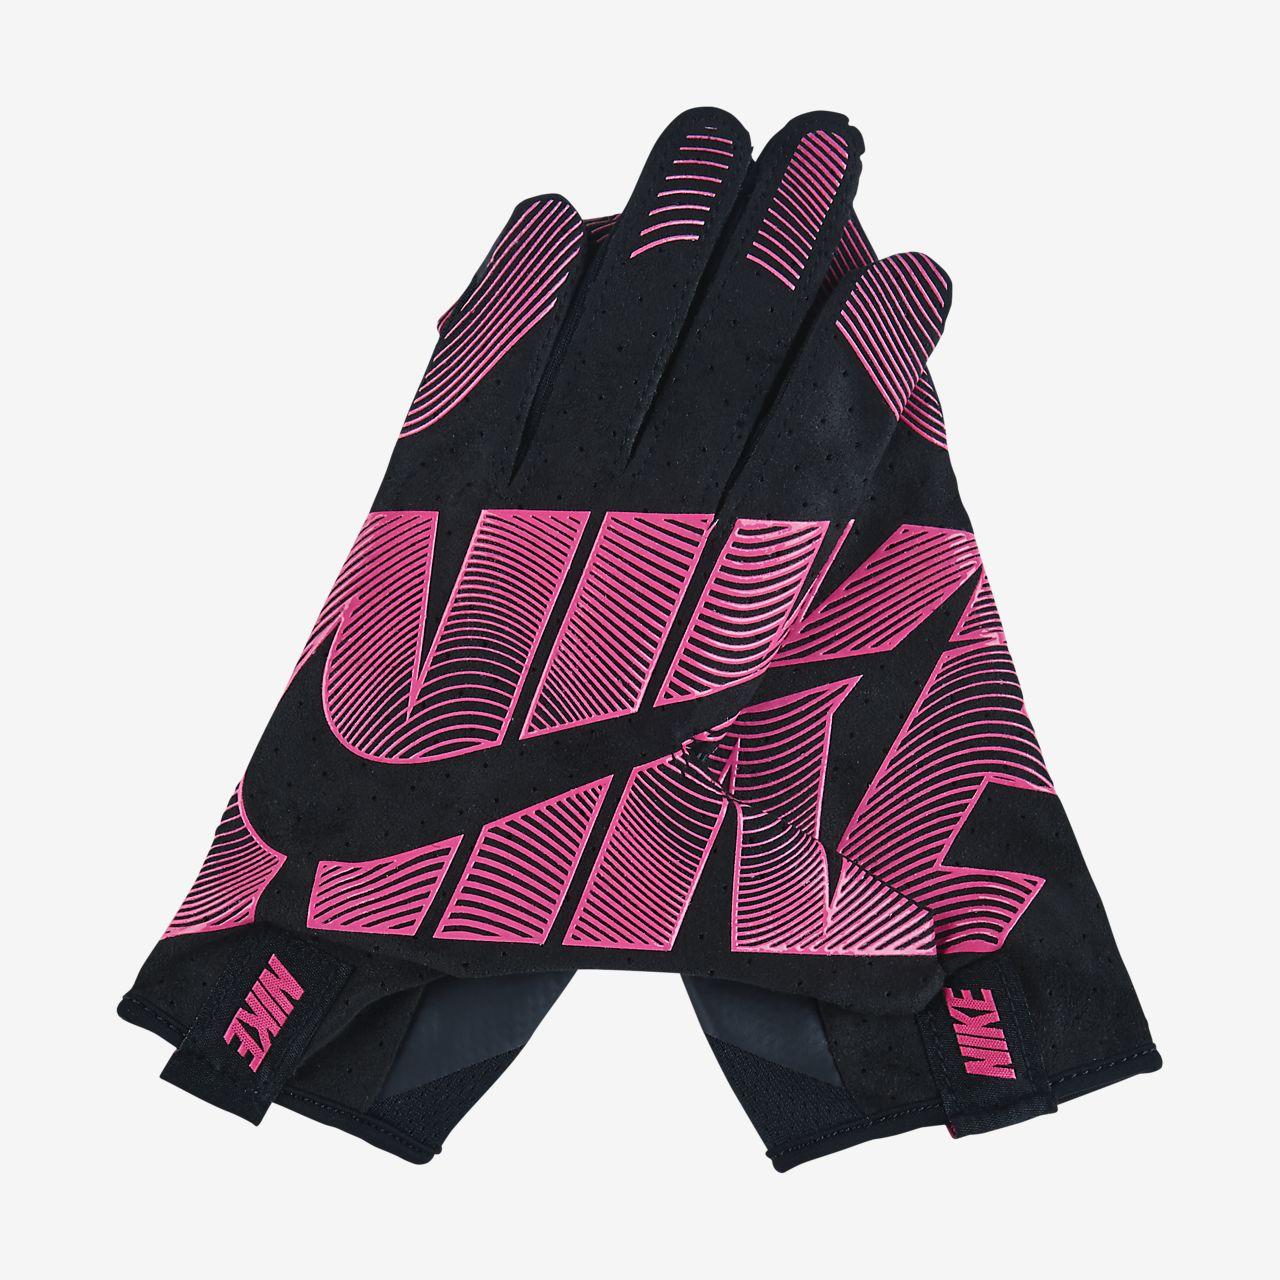 Nike Training Gloves Size Chart: NIKE WOMEN'S LUNATIC TRAINING GLOVES. Nike.com GB